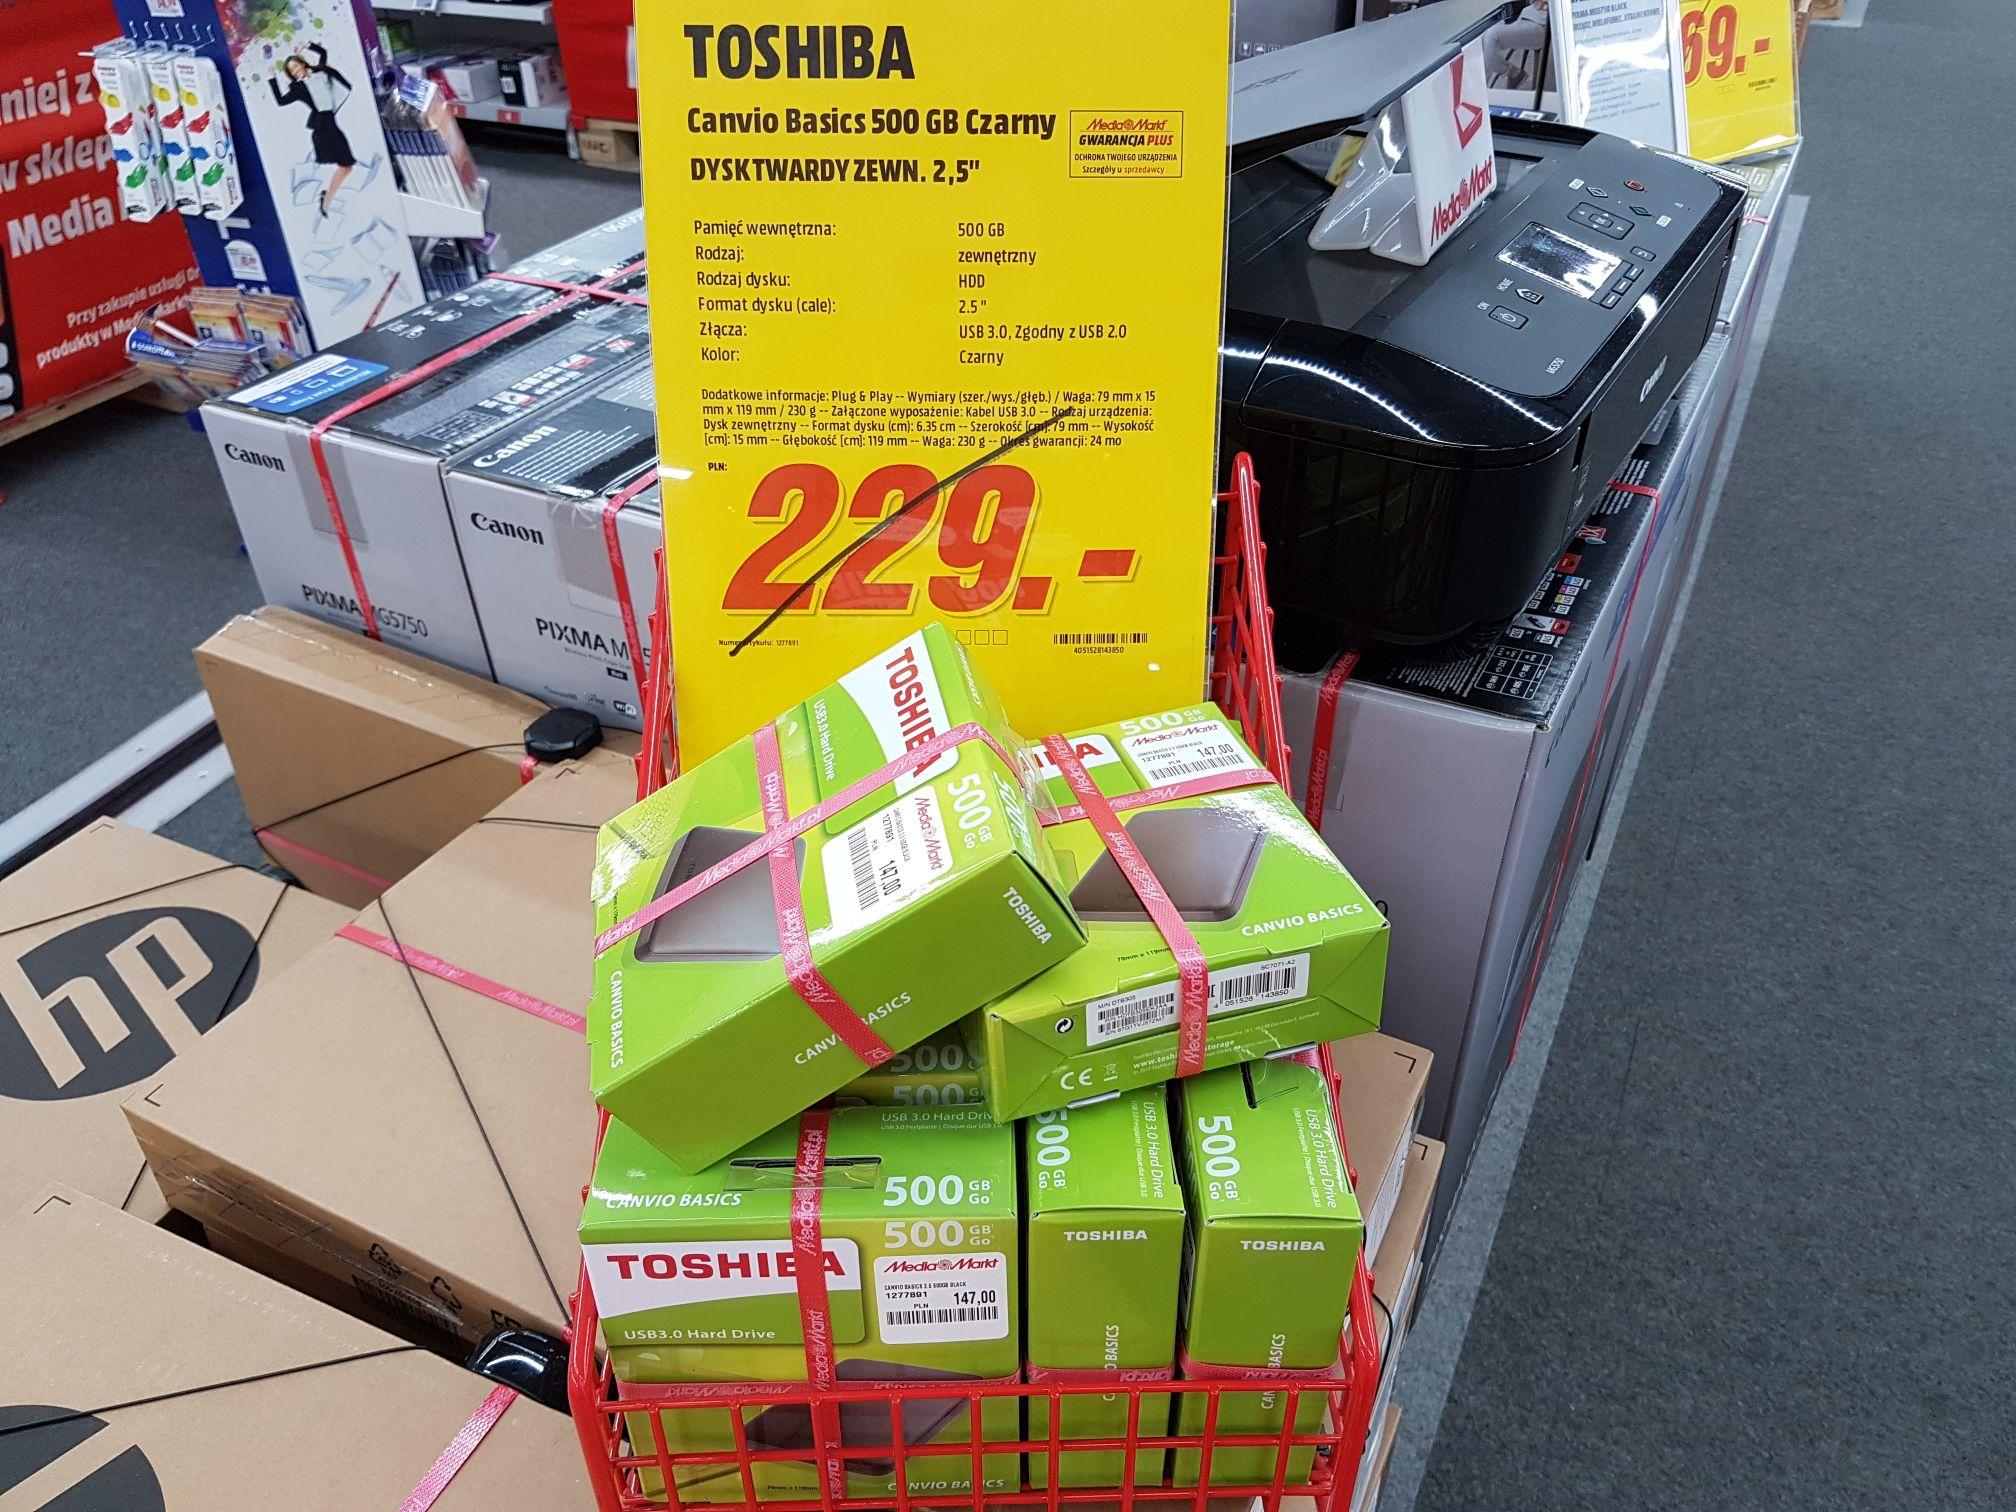 Media Markt Toshiba Canvio 500 GB